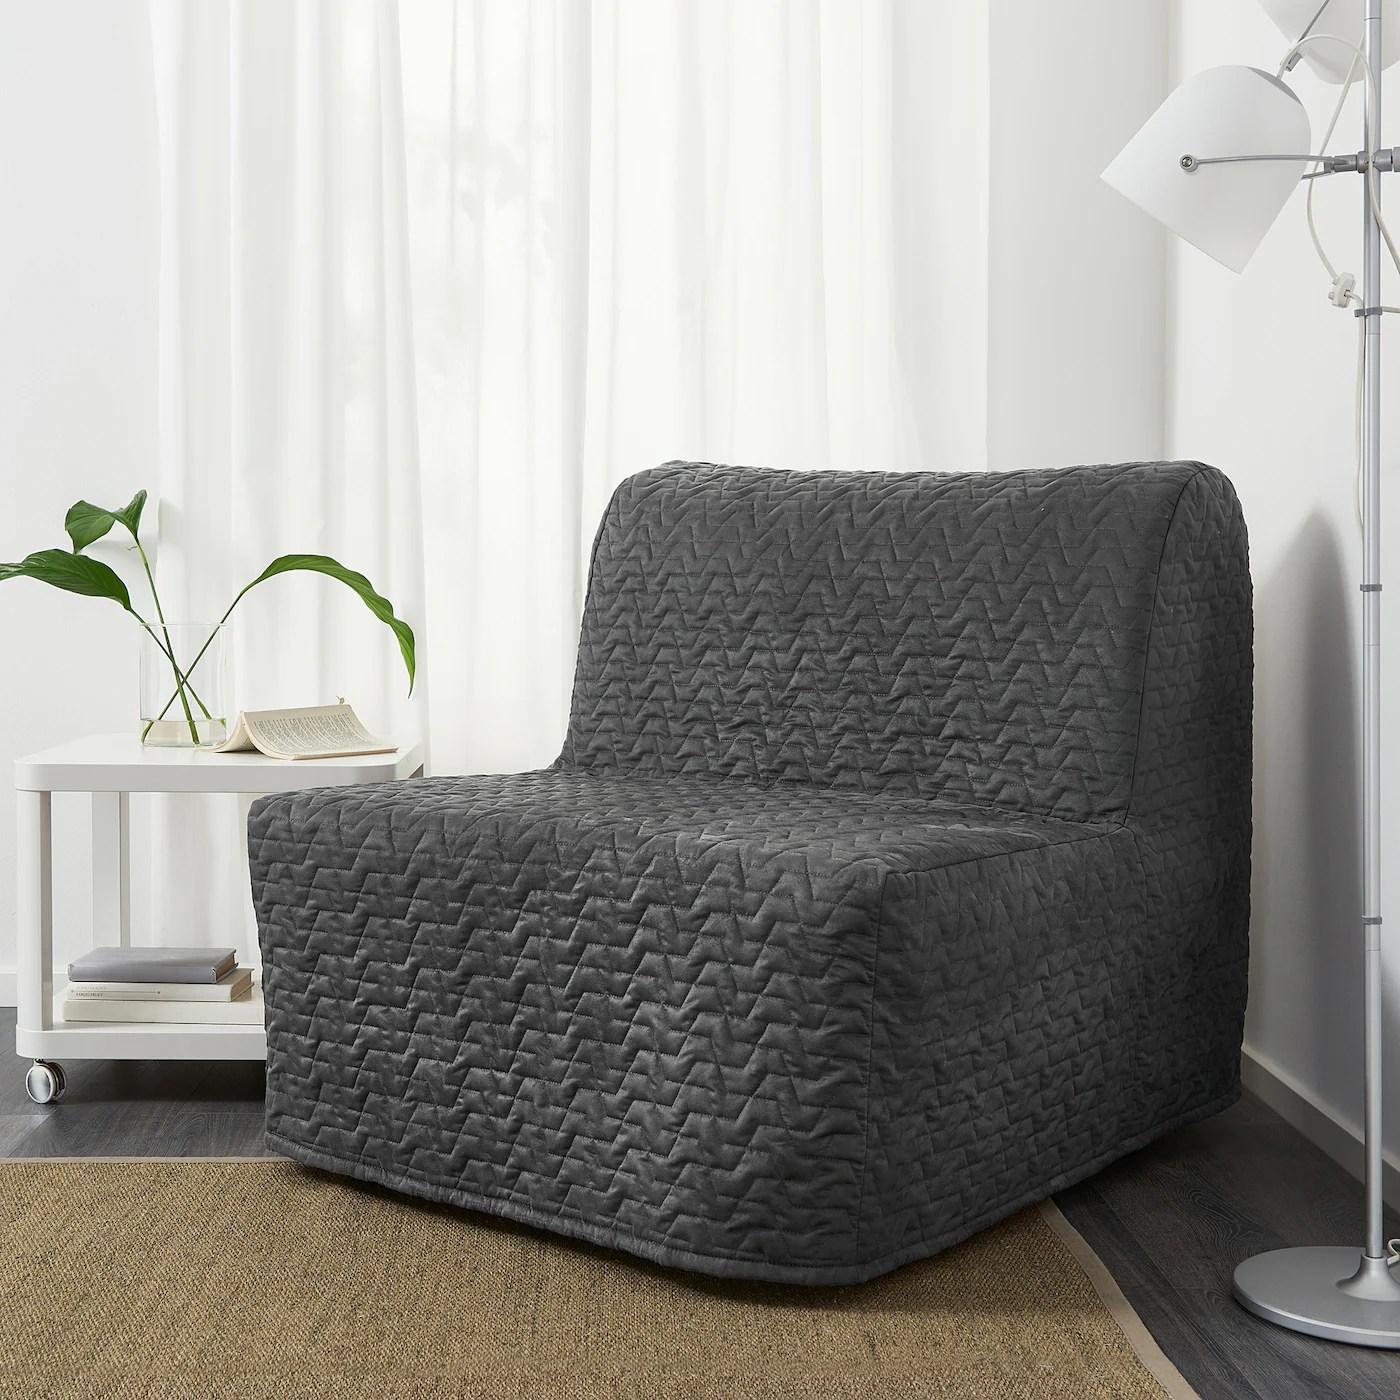 Lycksele Murbo Vallarum Grey Chair Bed Ikea